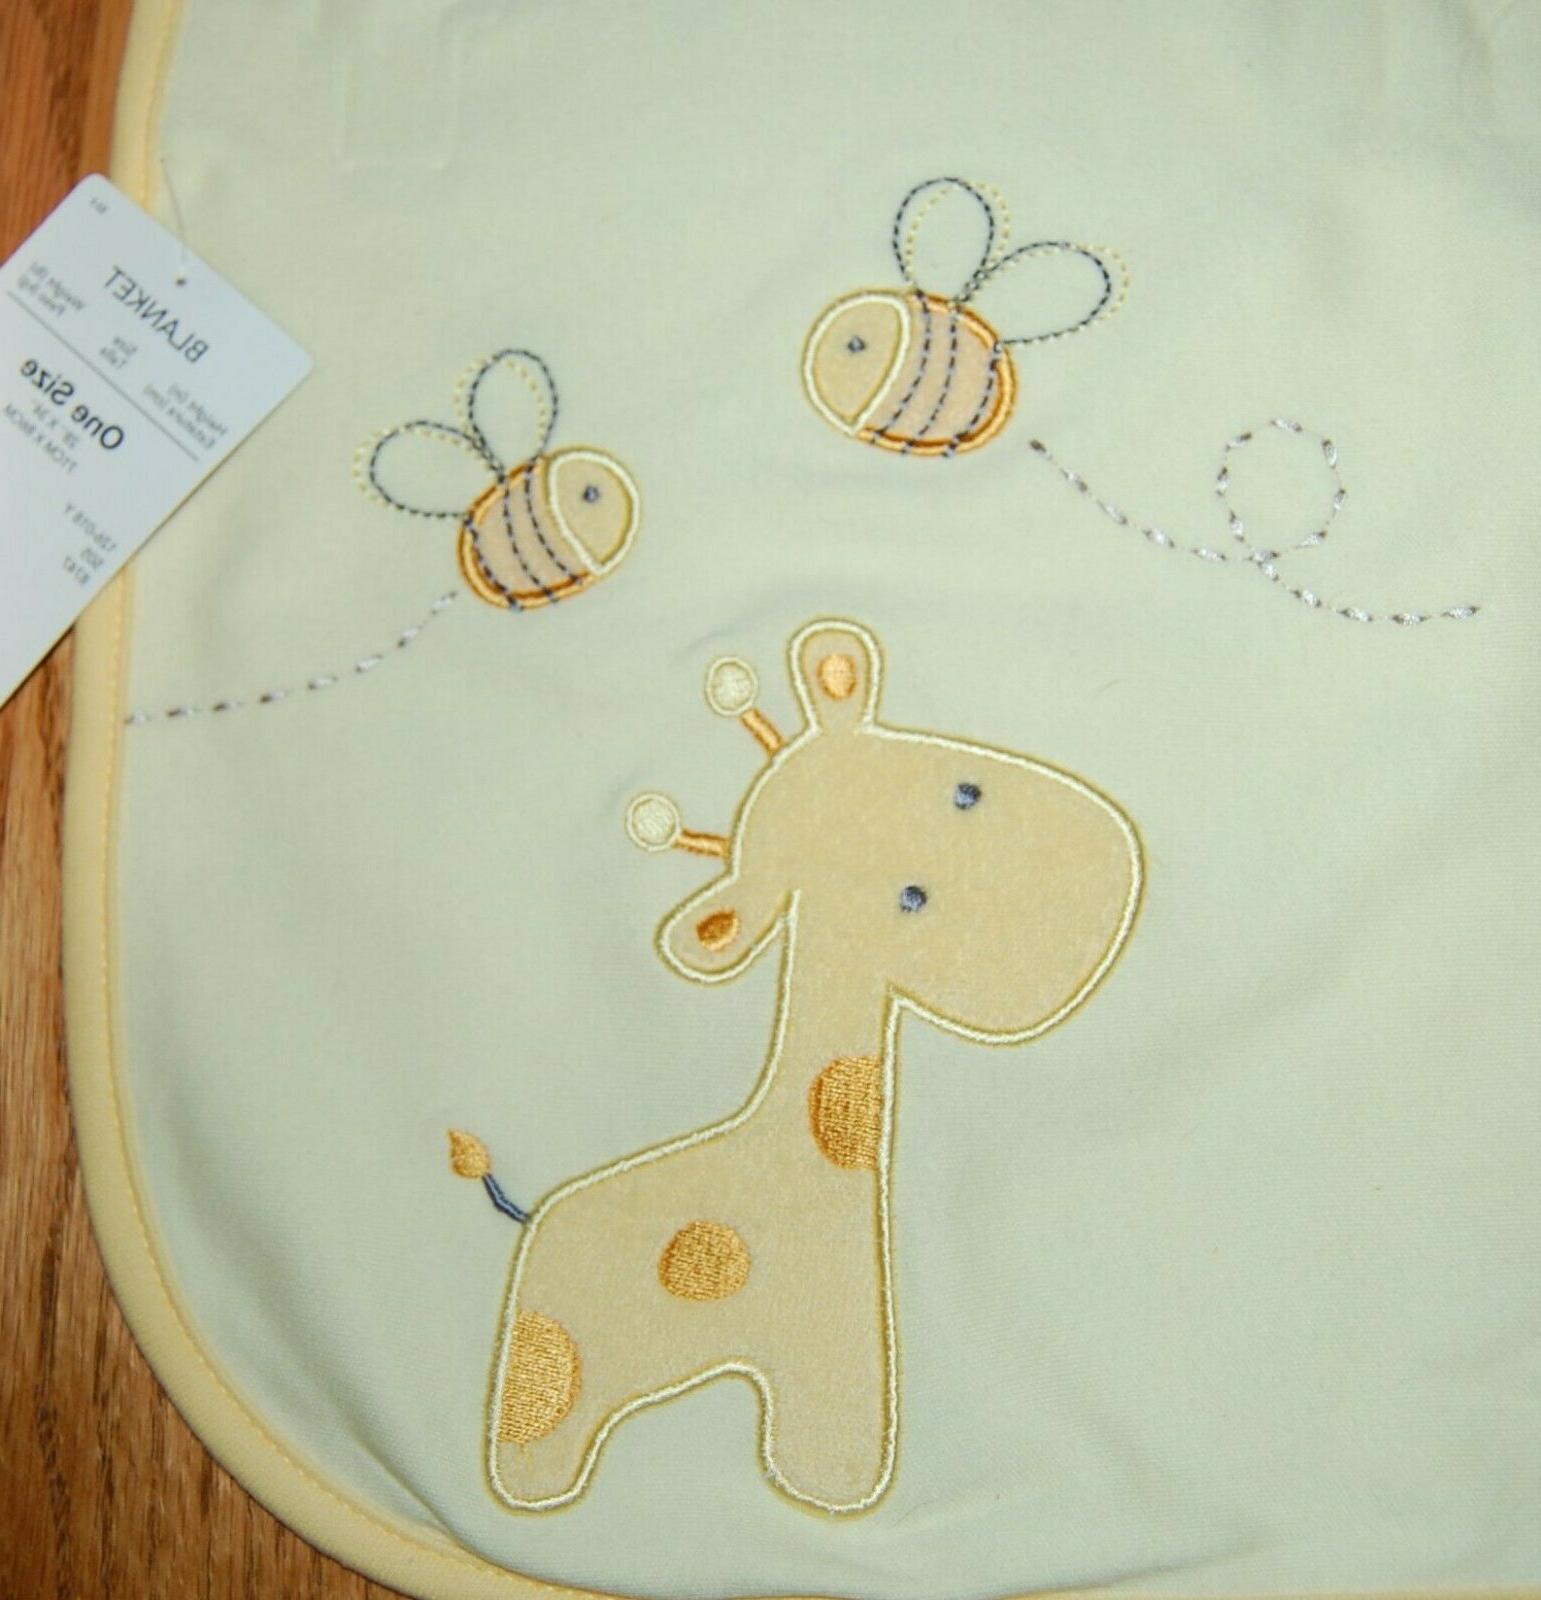 Carter's blanket giraffe, bees, zoo NWT